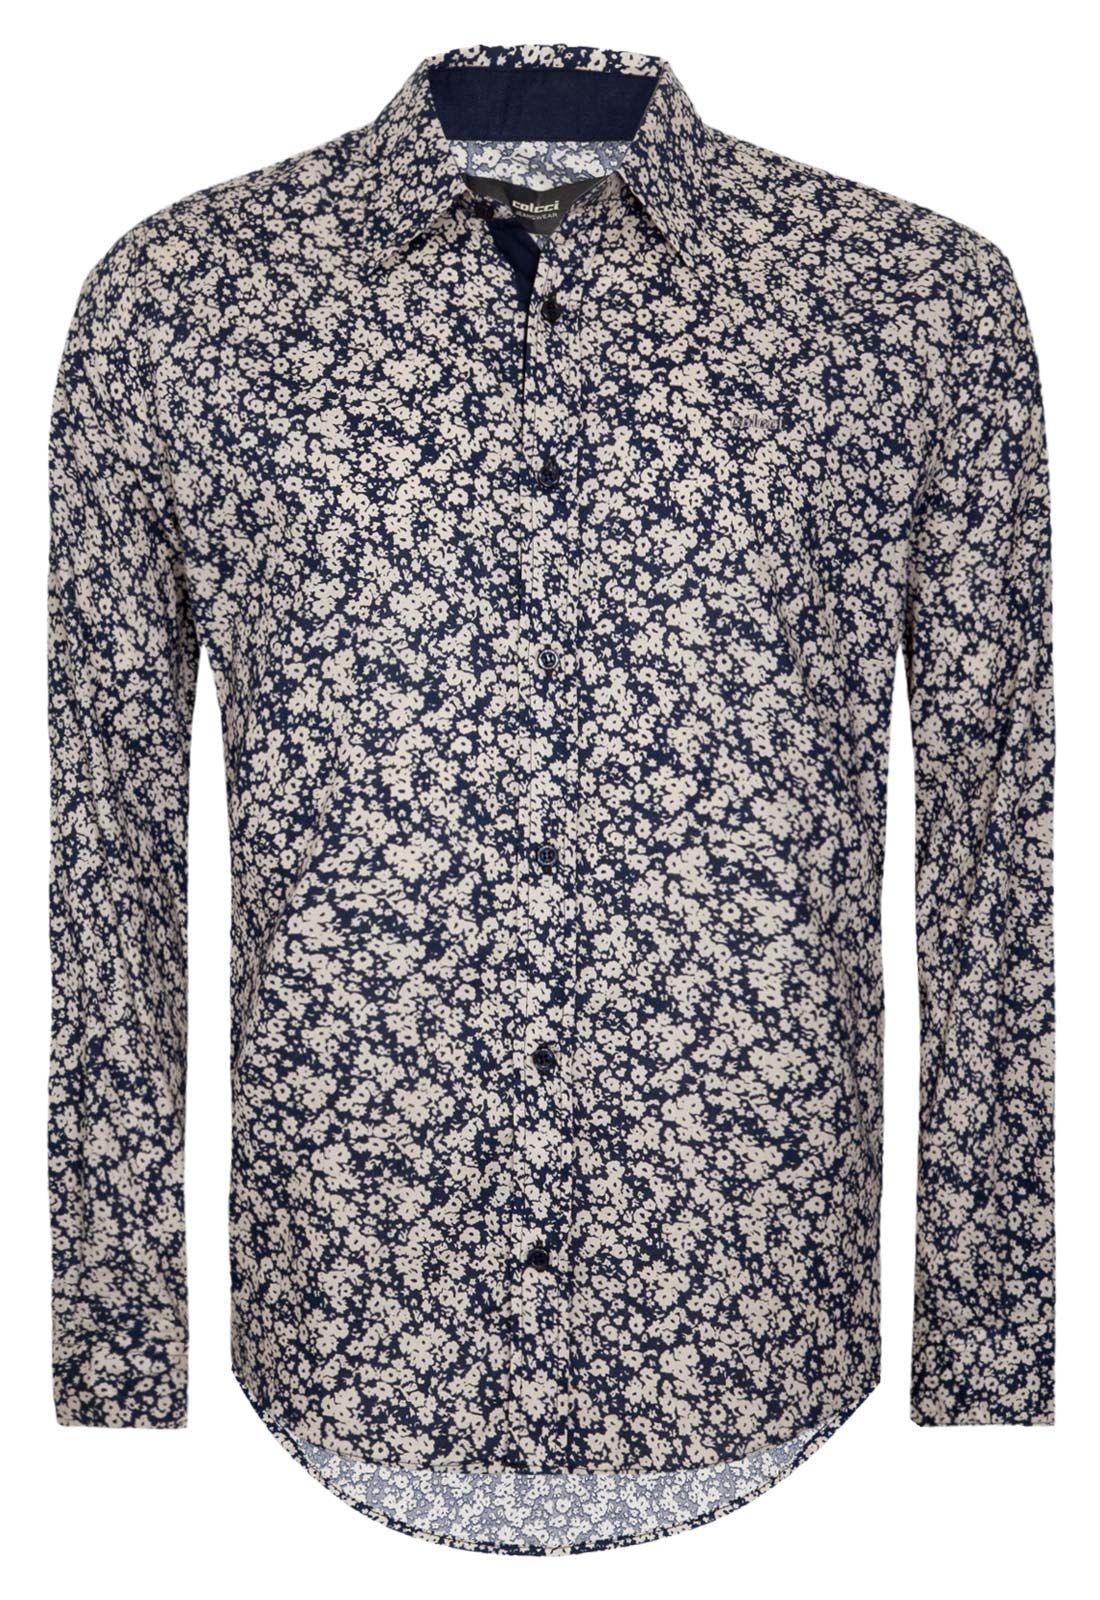 898e29f21 Camisa Colcci masculina floral | john MDB2 | Moda floral, Moda e ...